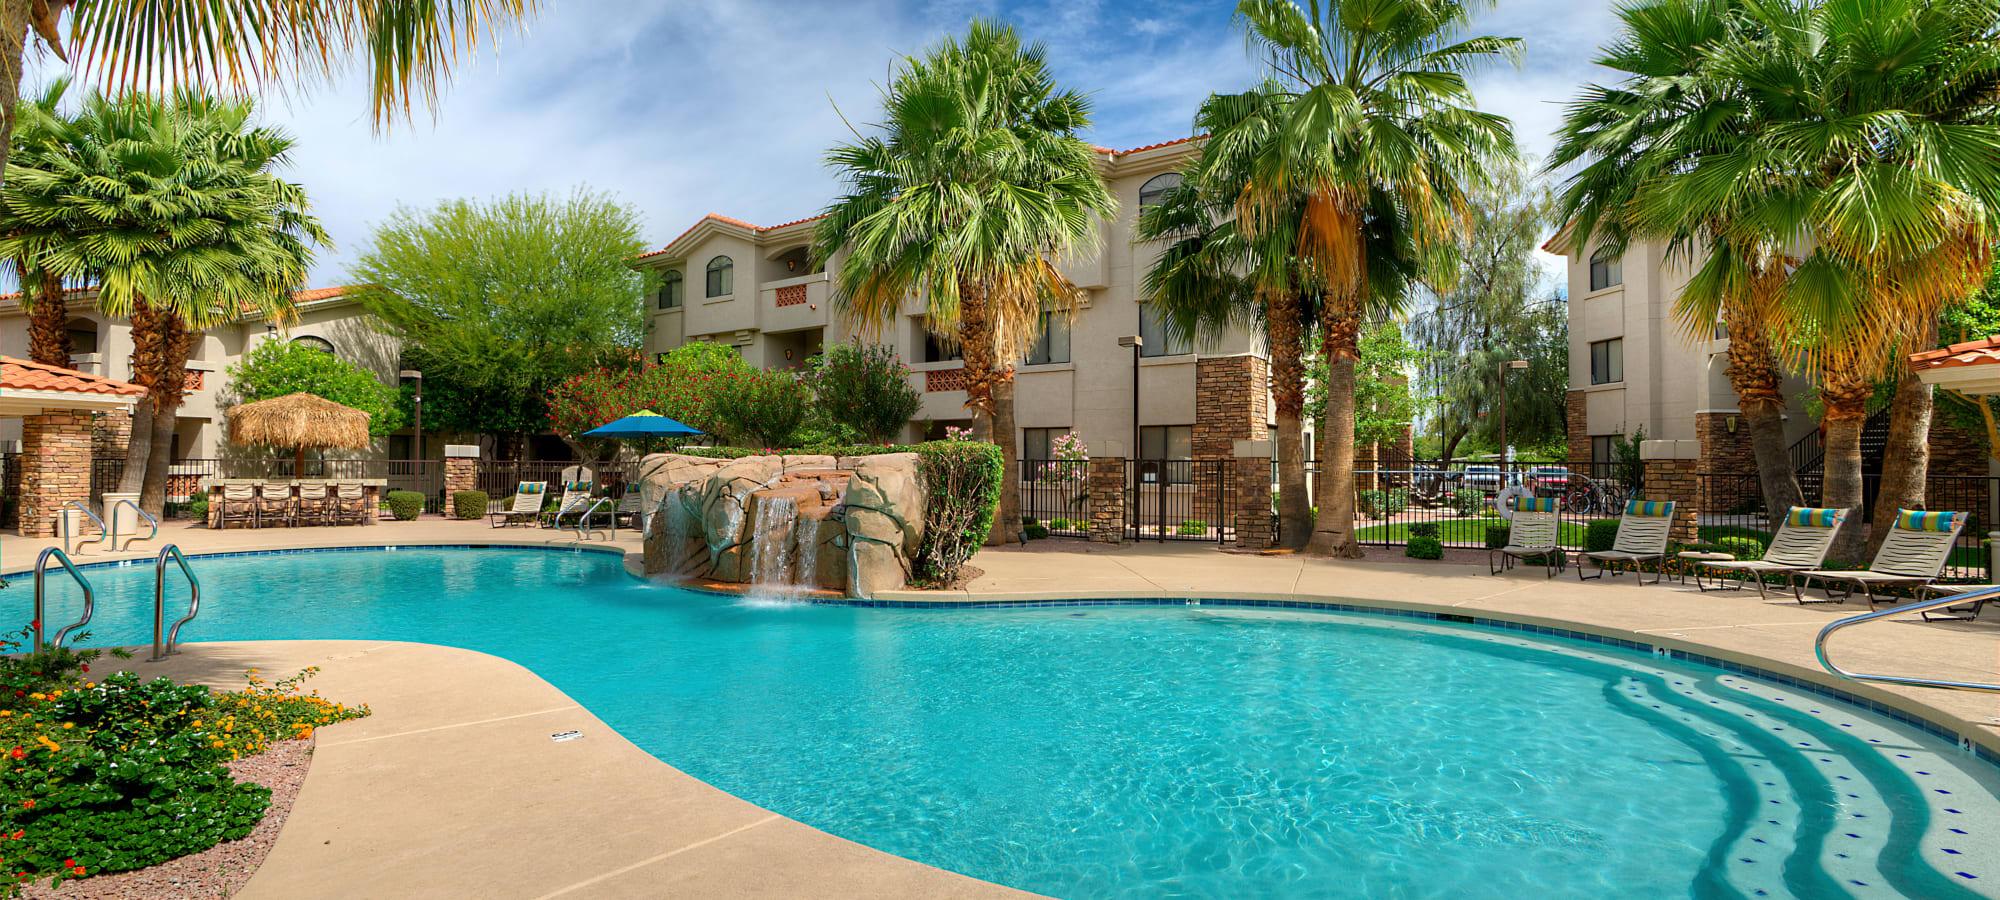 Large resort swimming pool at San Hacienda in Chandler, Arizona